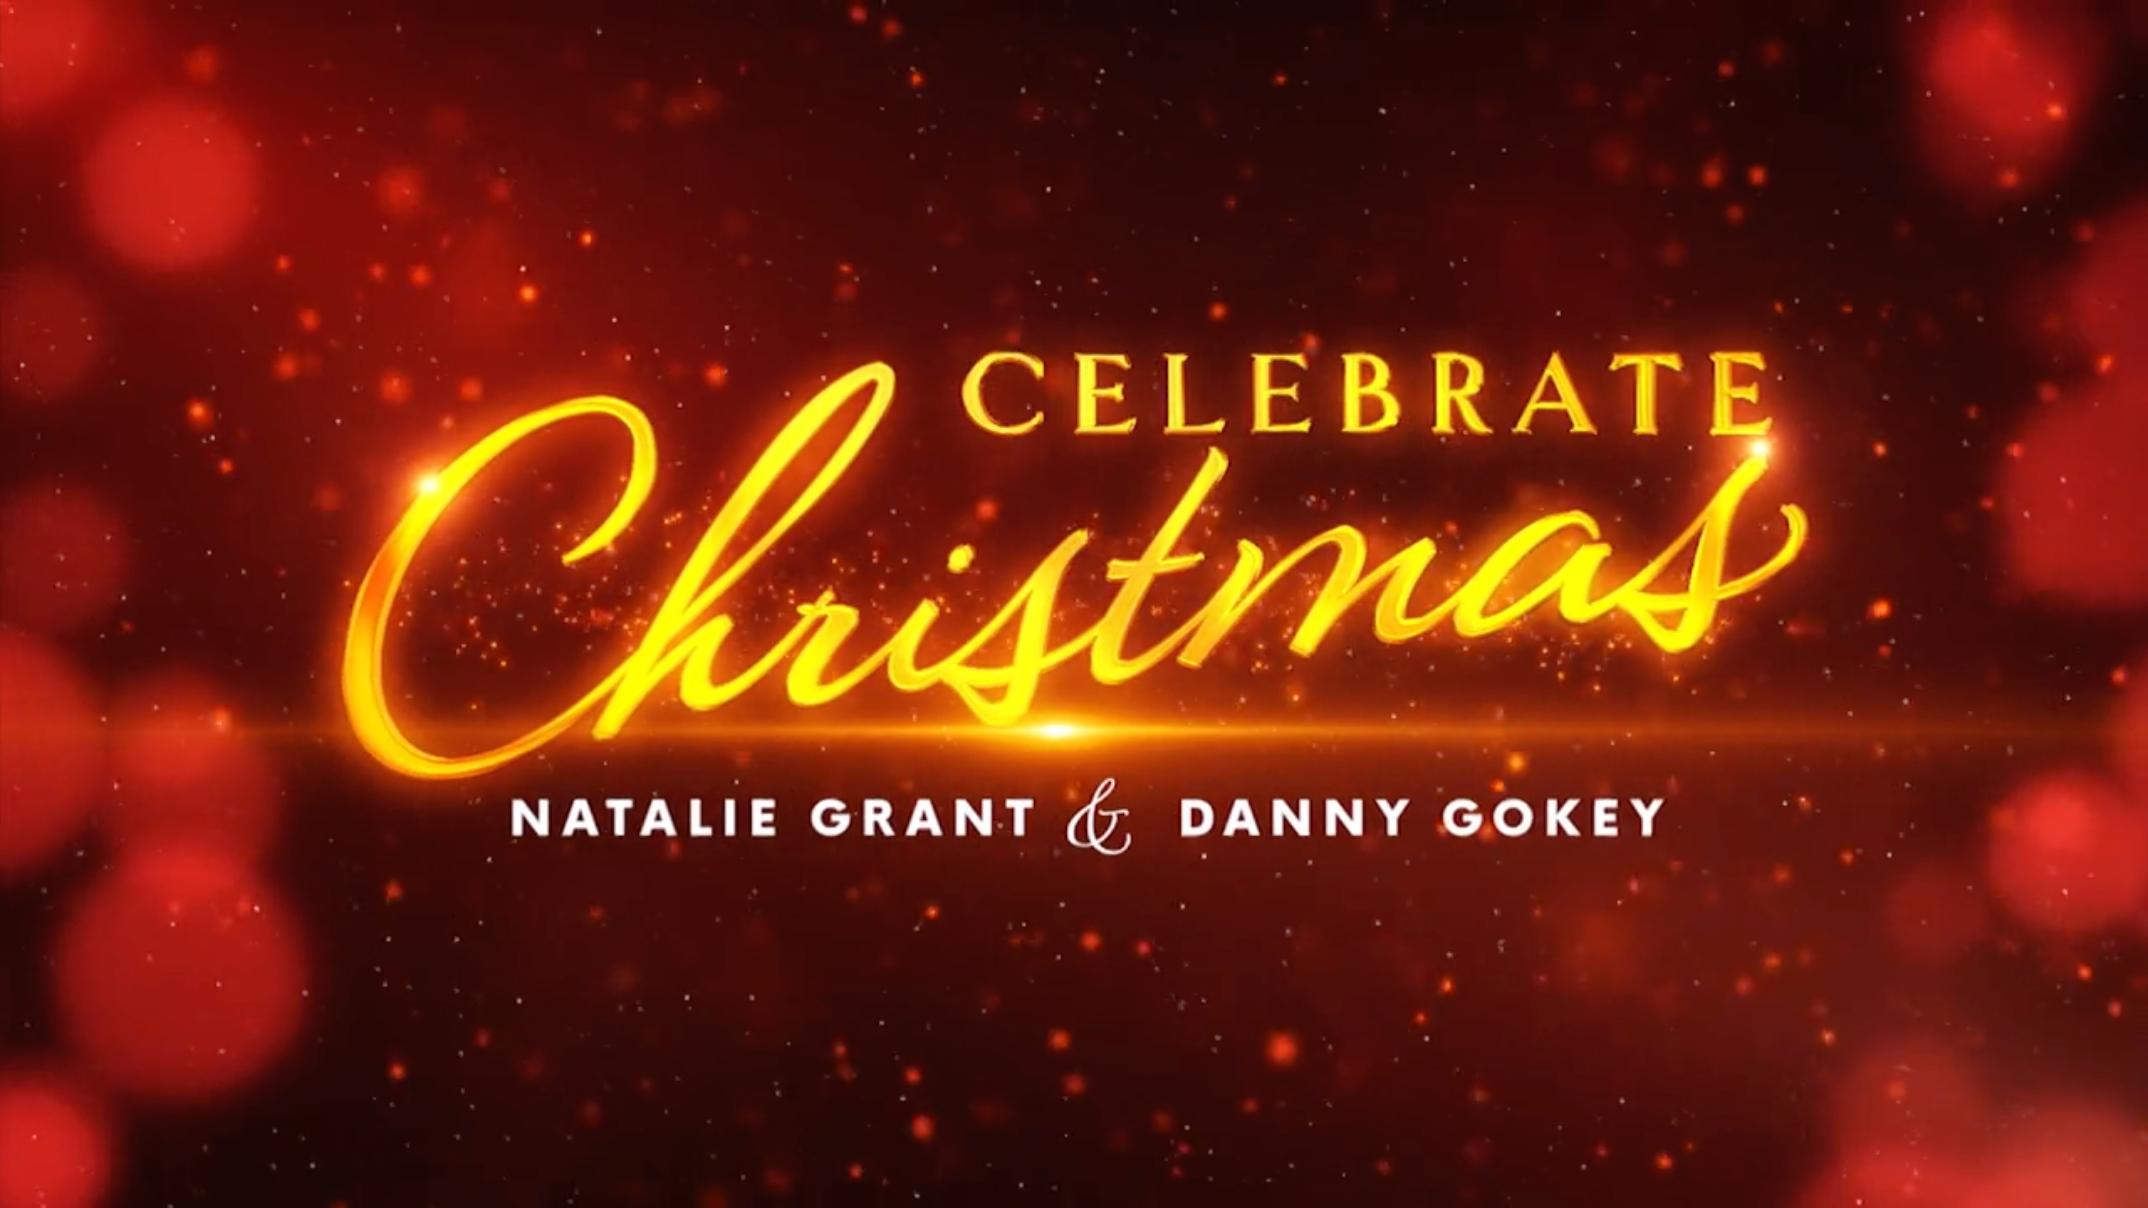 Celebrate Christmas with Natalie Grant & Danny Gokey